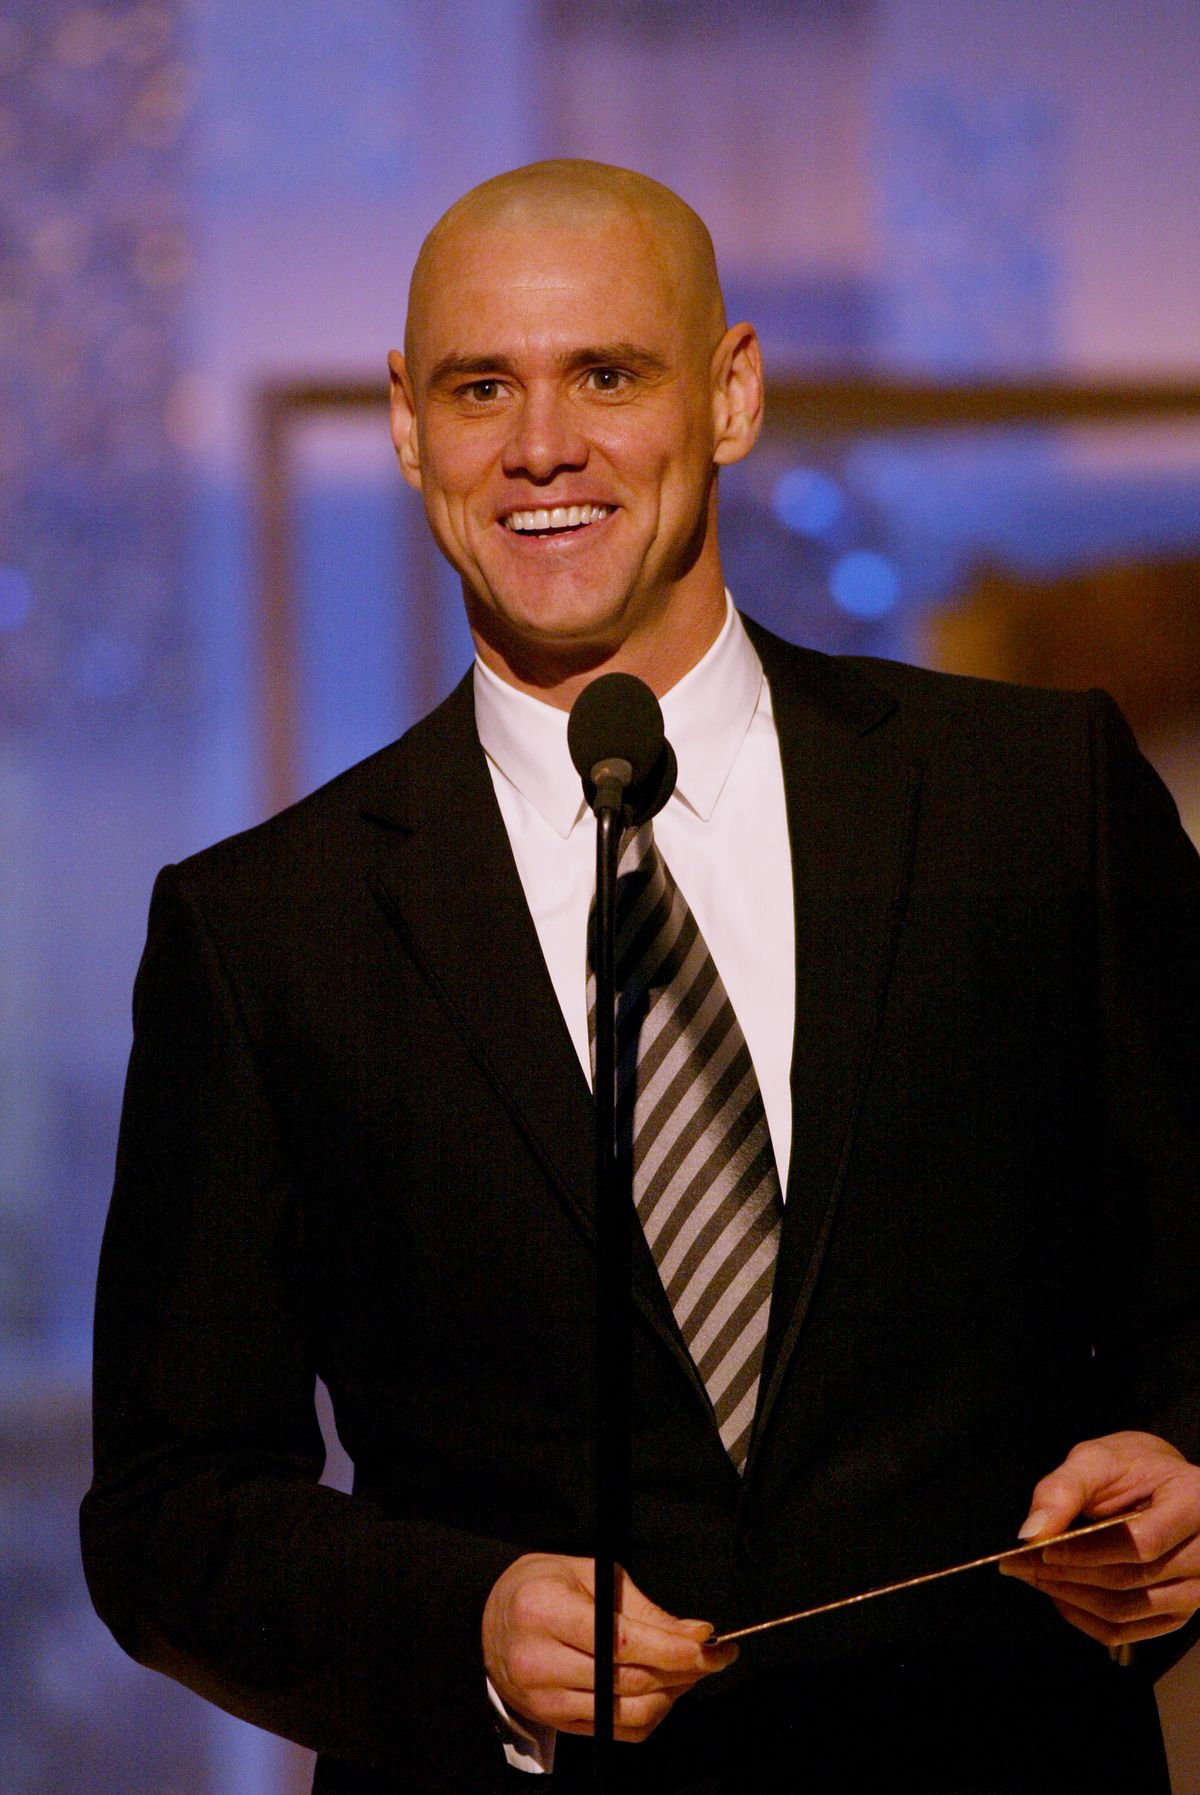 61st Annual Golden Globe Awards - Show